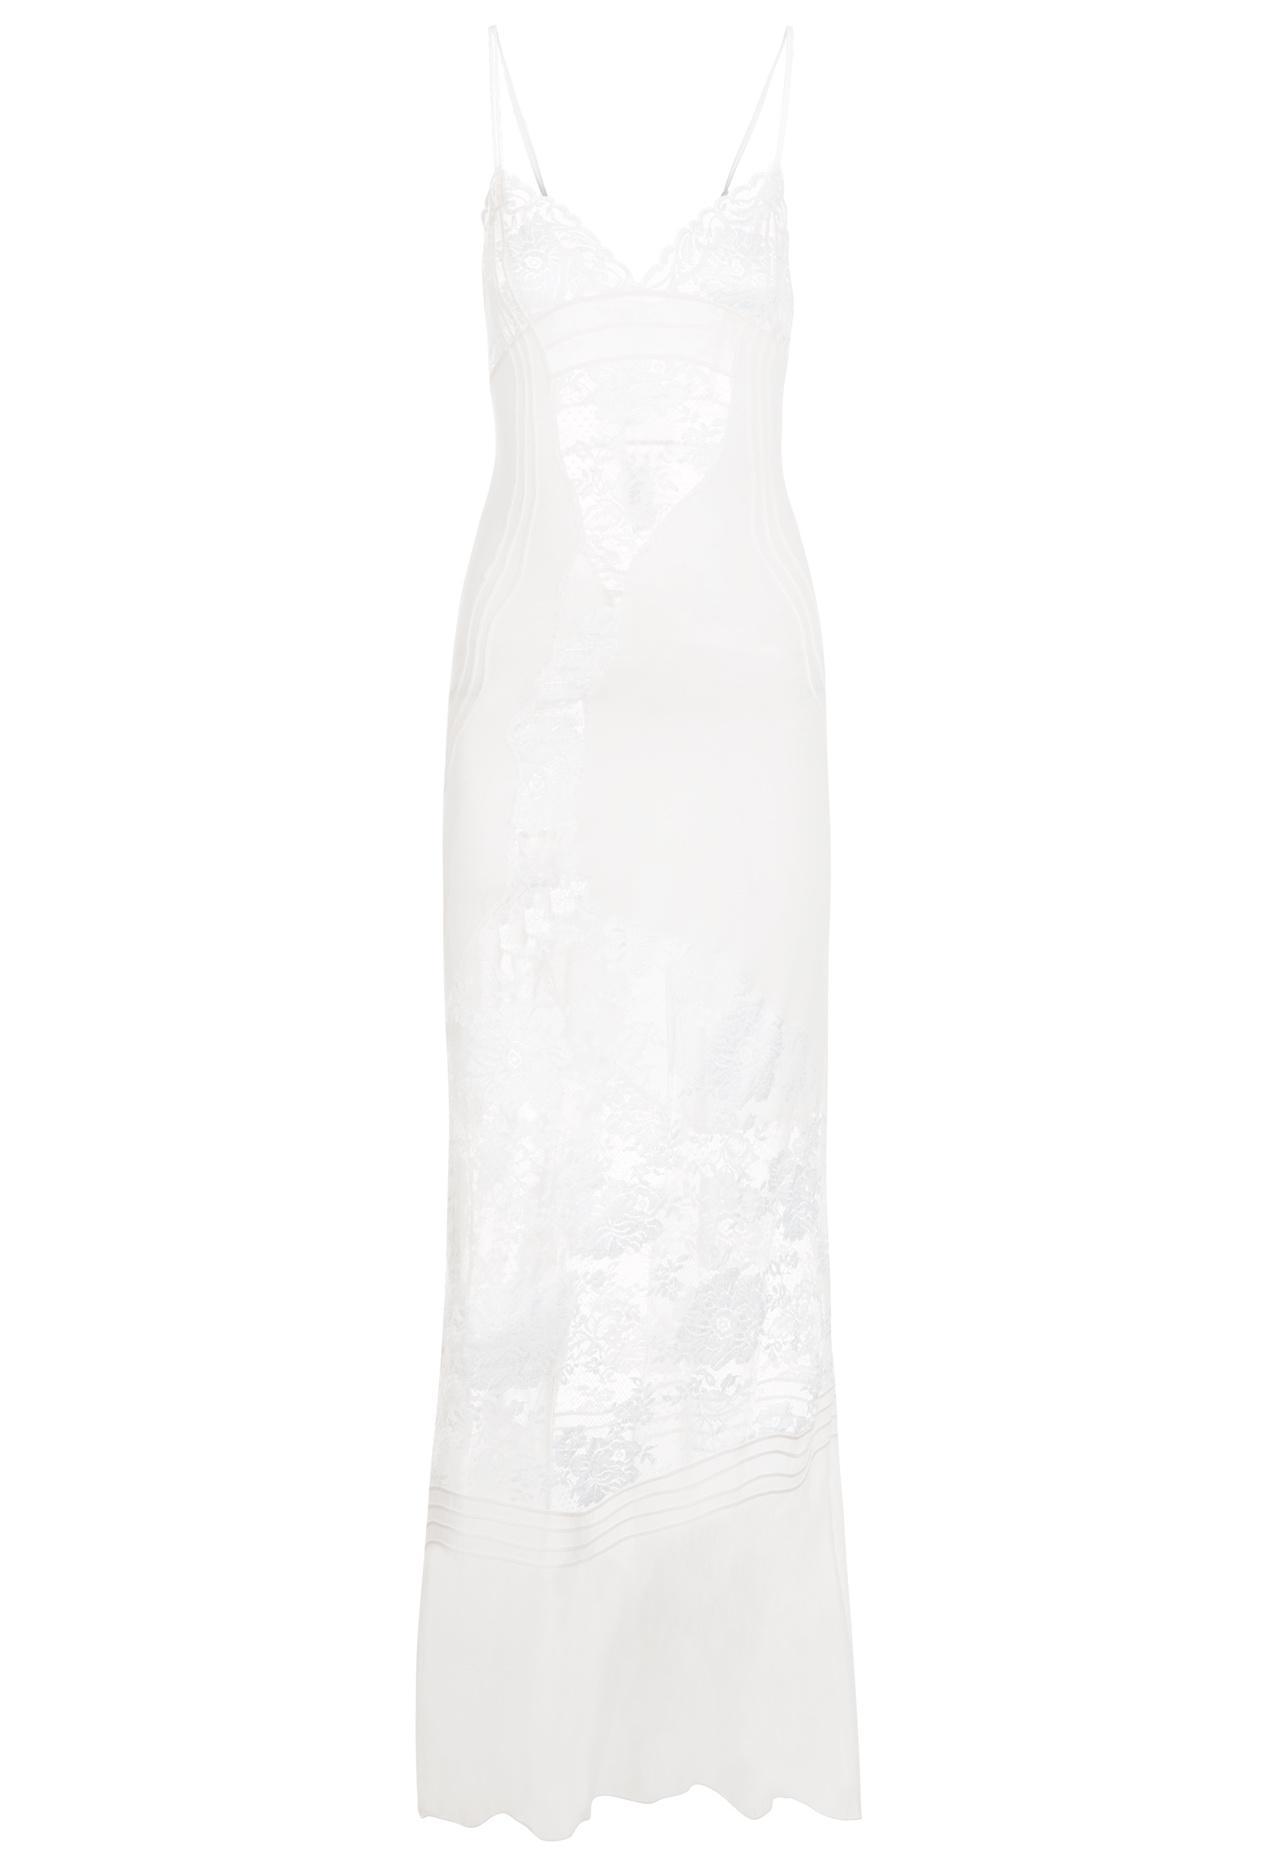 dd9a5f2e7931 Featured. La Perla   Off-white Silk Georgette And Leavers Lace Nightgown  With ...